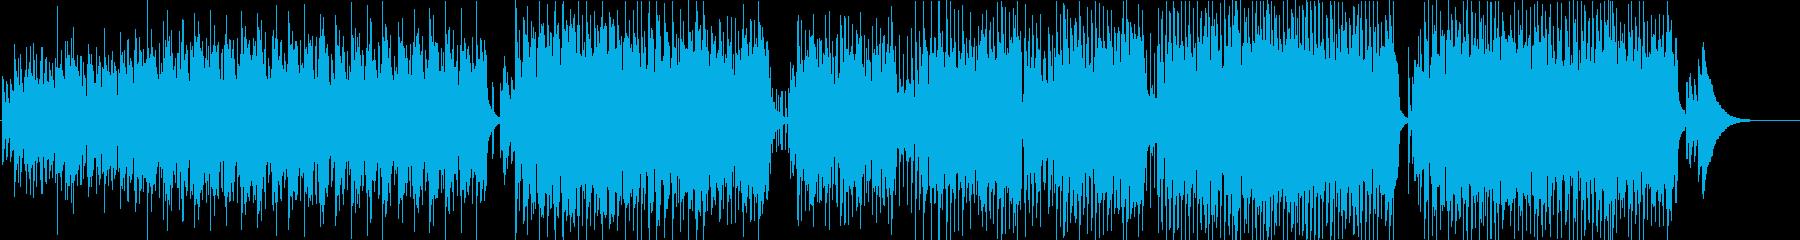 Heartwarming cute acoustic pop's reproduced waveform